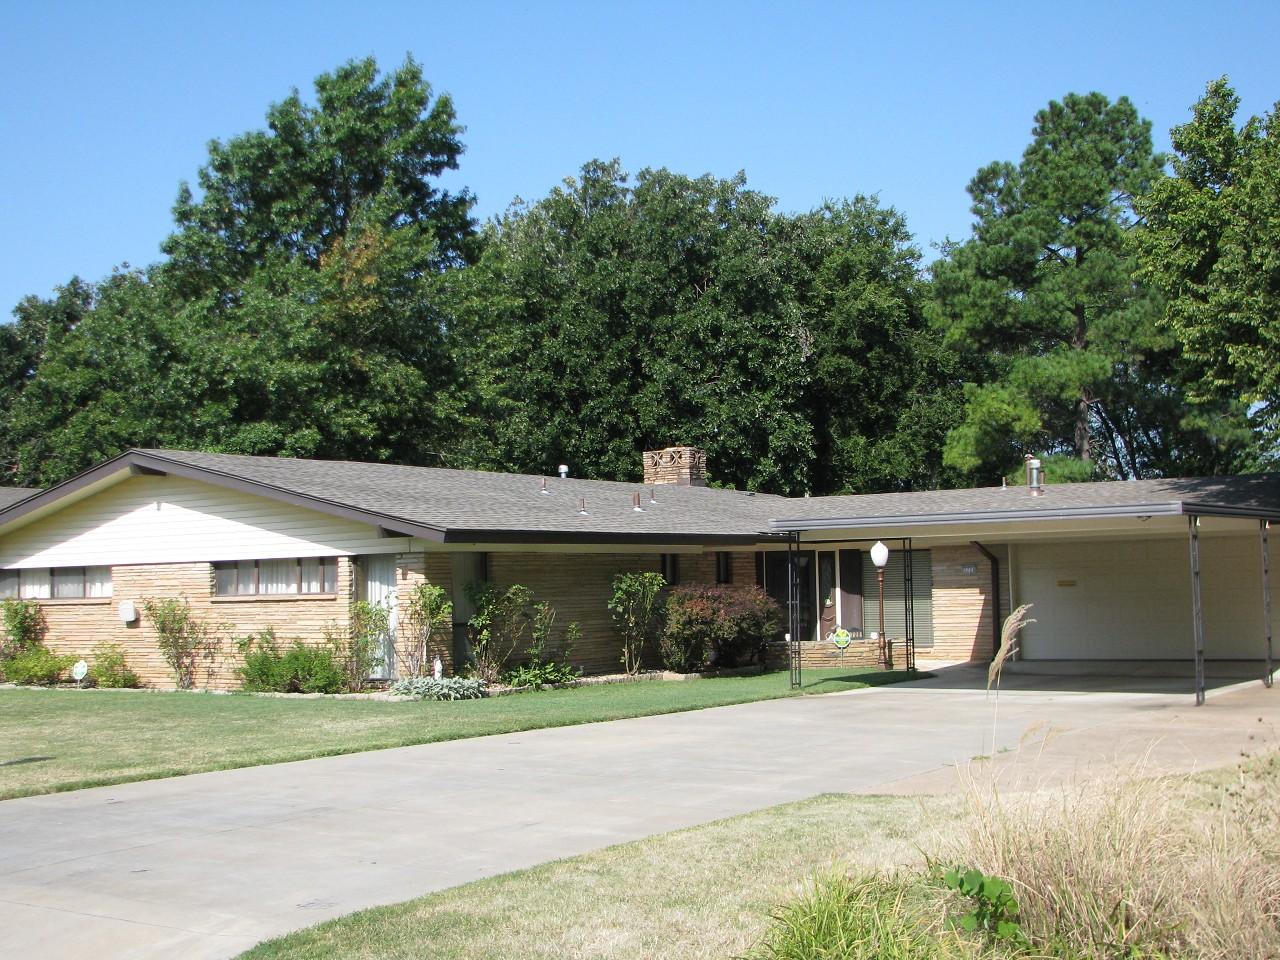 Real Estate for Sale, ListingId: 29696377, Tulsa,OK74112